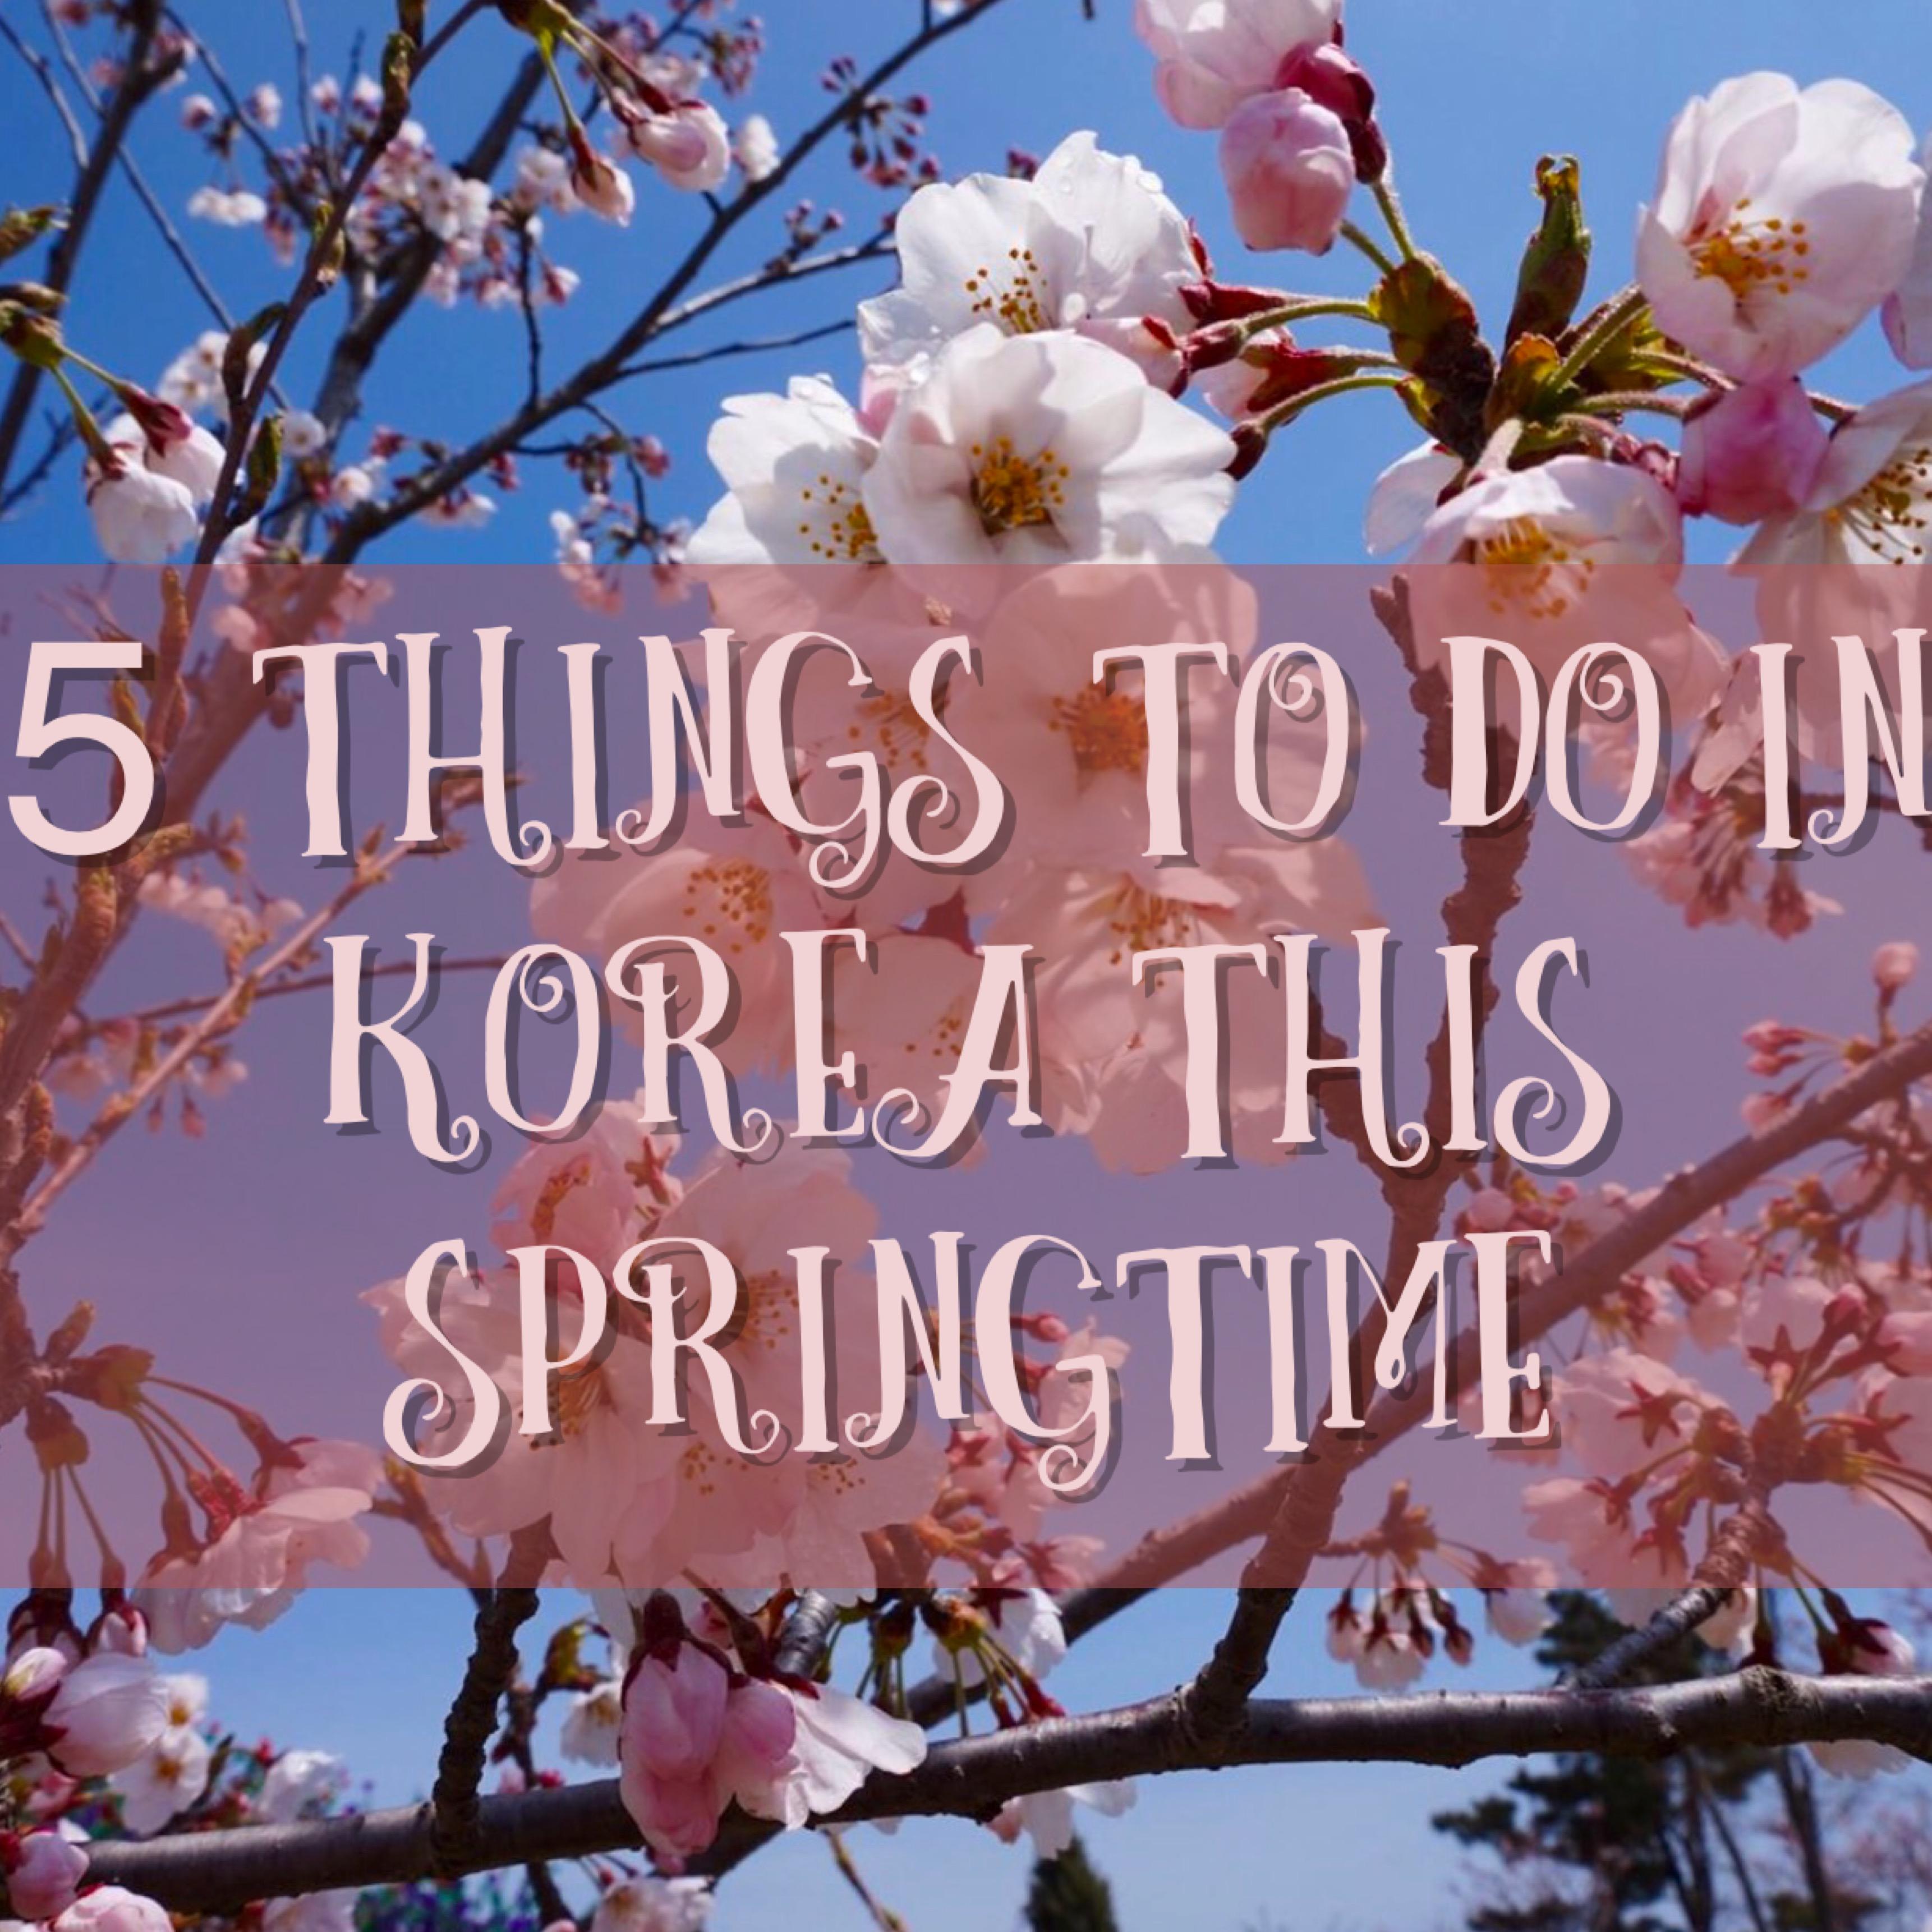 5 Things to do in Korea this Springtime